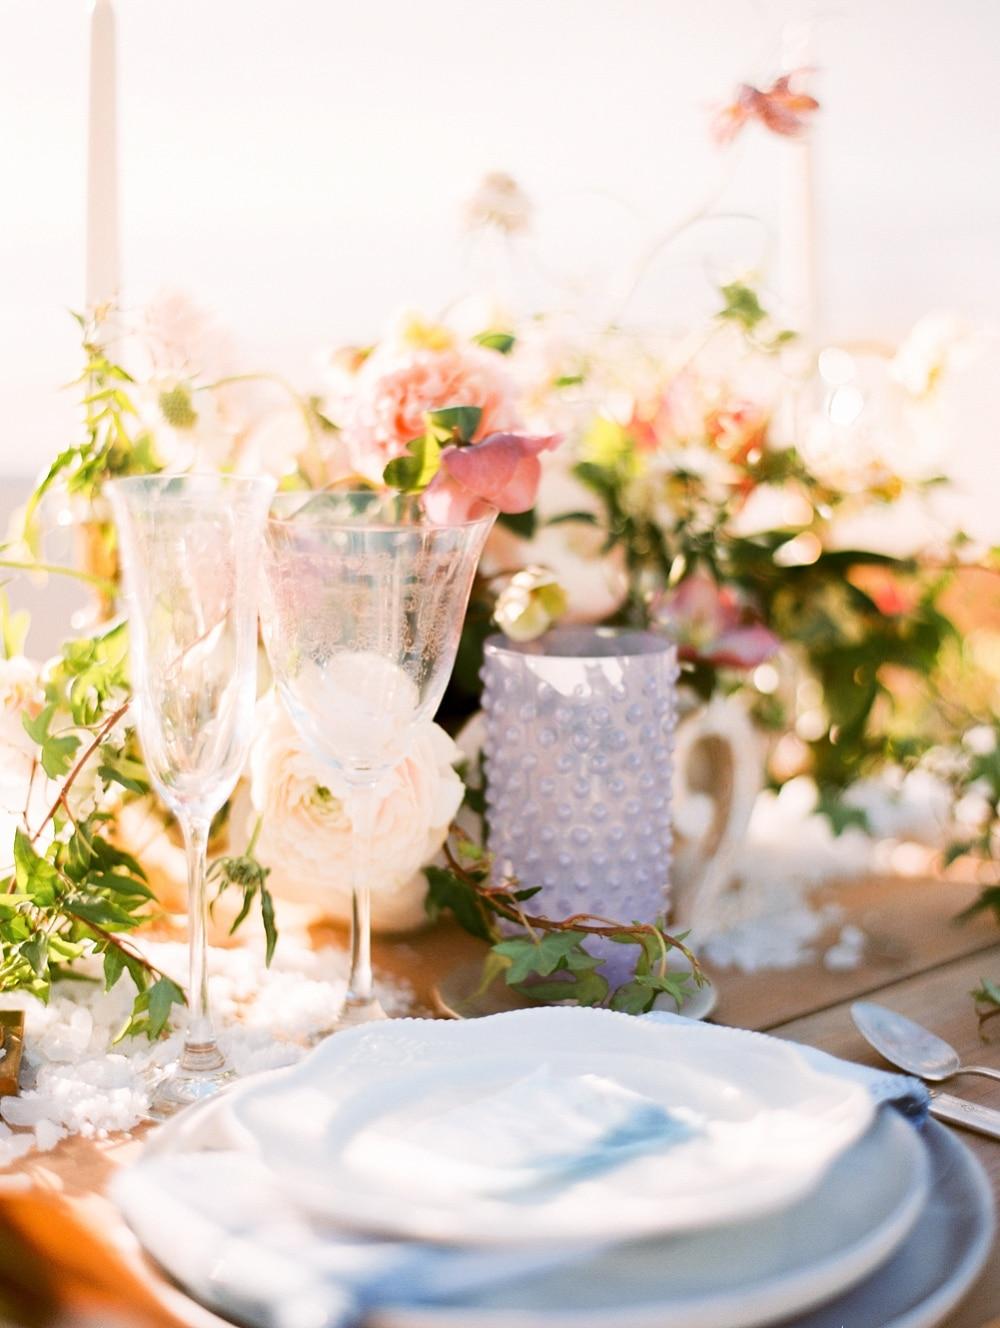 Kristin-La-Voie-Photography-San-Diego-Wedding-Photographer-21